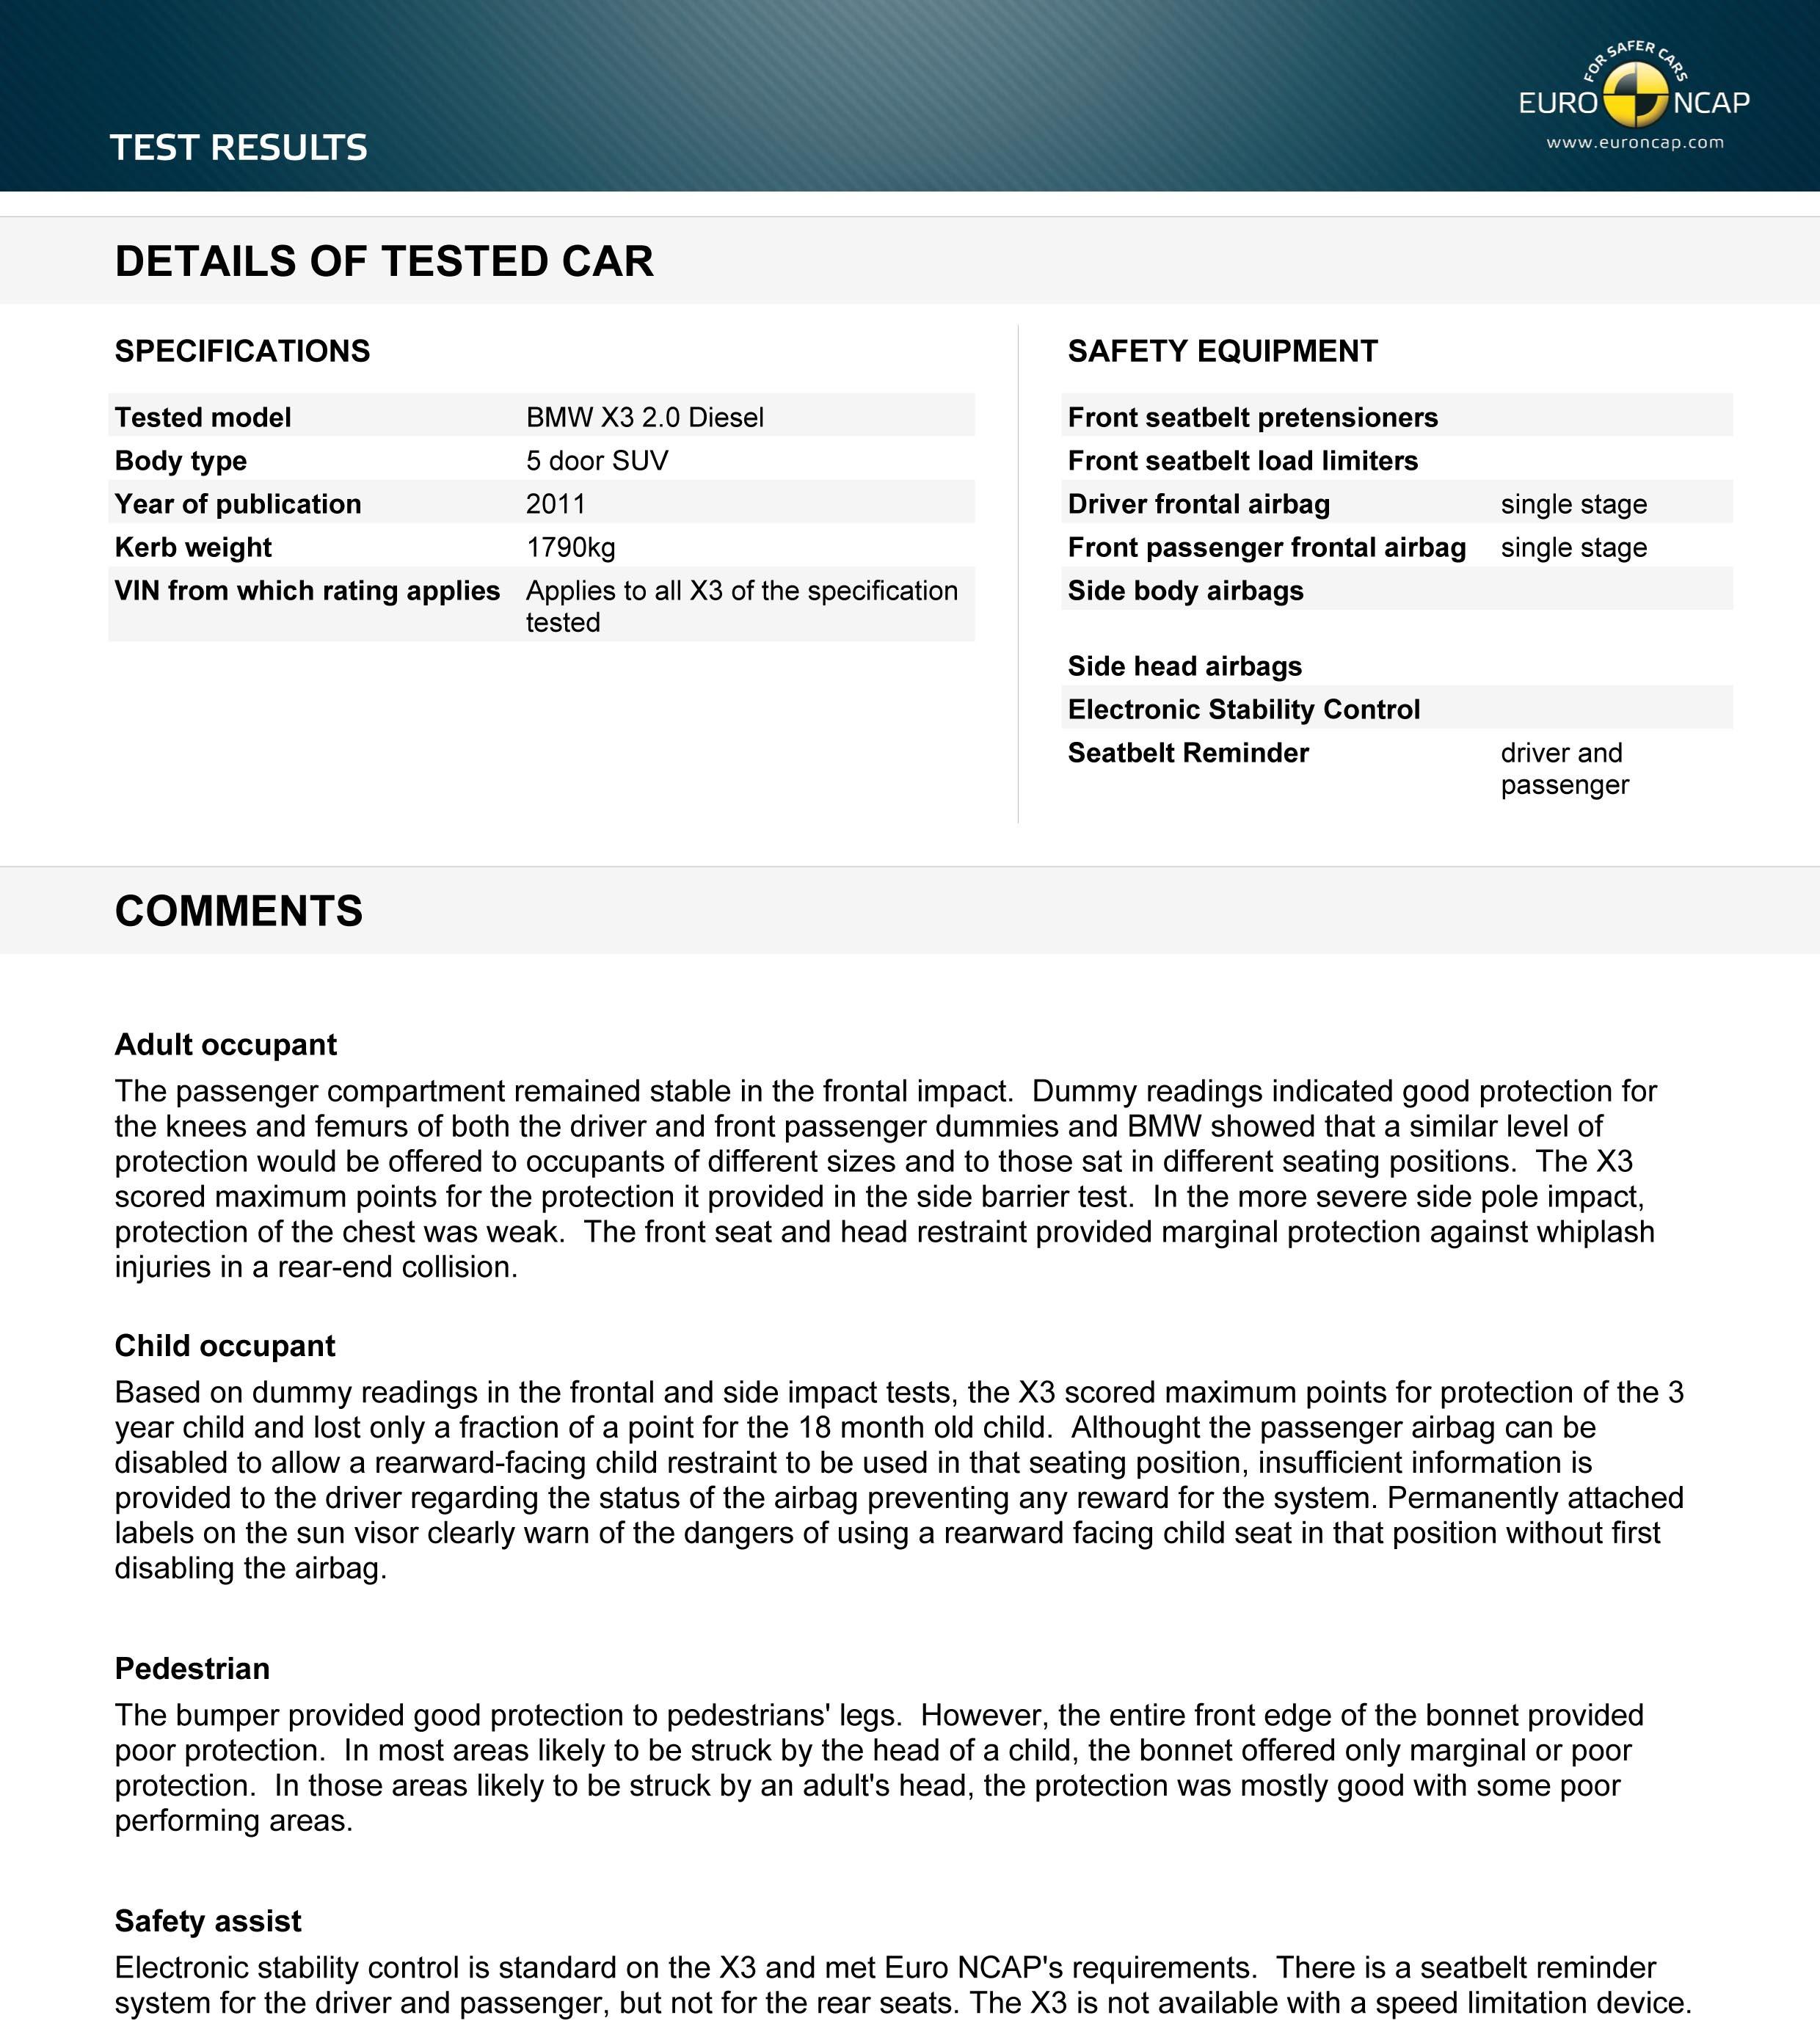 sim337 october 2011 exam assessment Bsa 400 week 2 assessment of enterprise-level business systems paper  devry busn420 week 1 quiz latest 2015 october devry mgmt303 mid-term exam  (sim337.